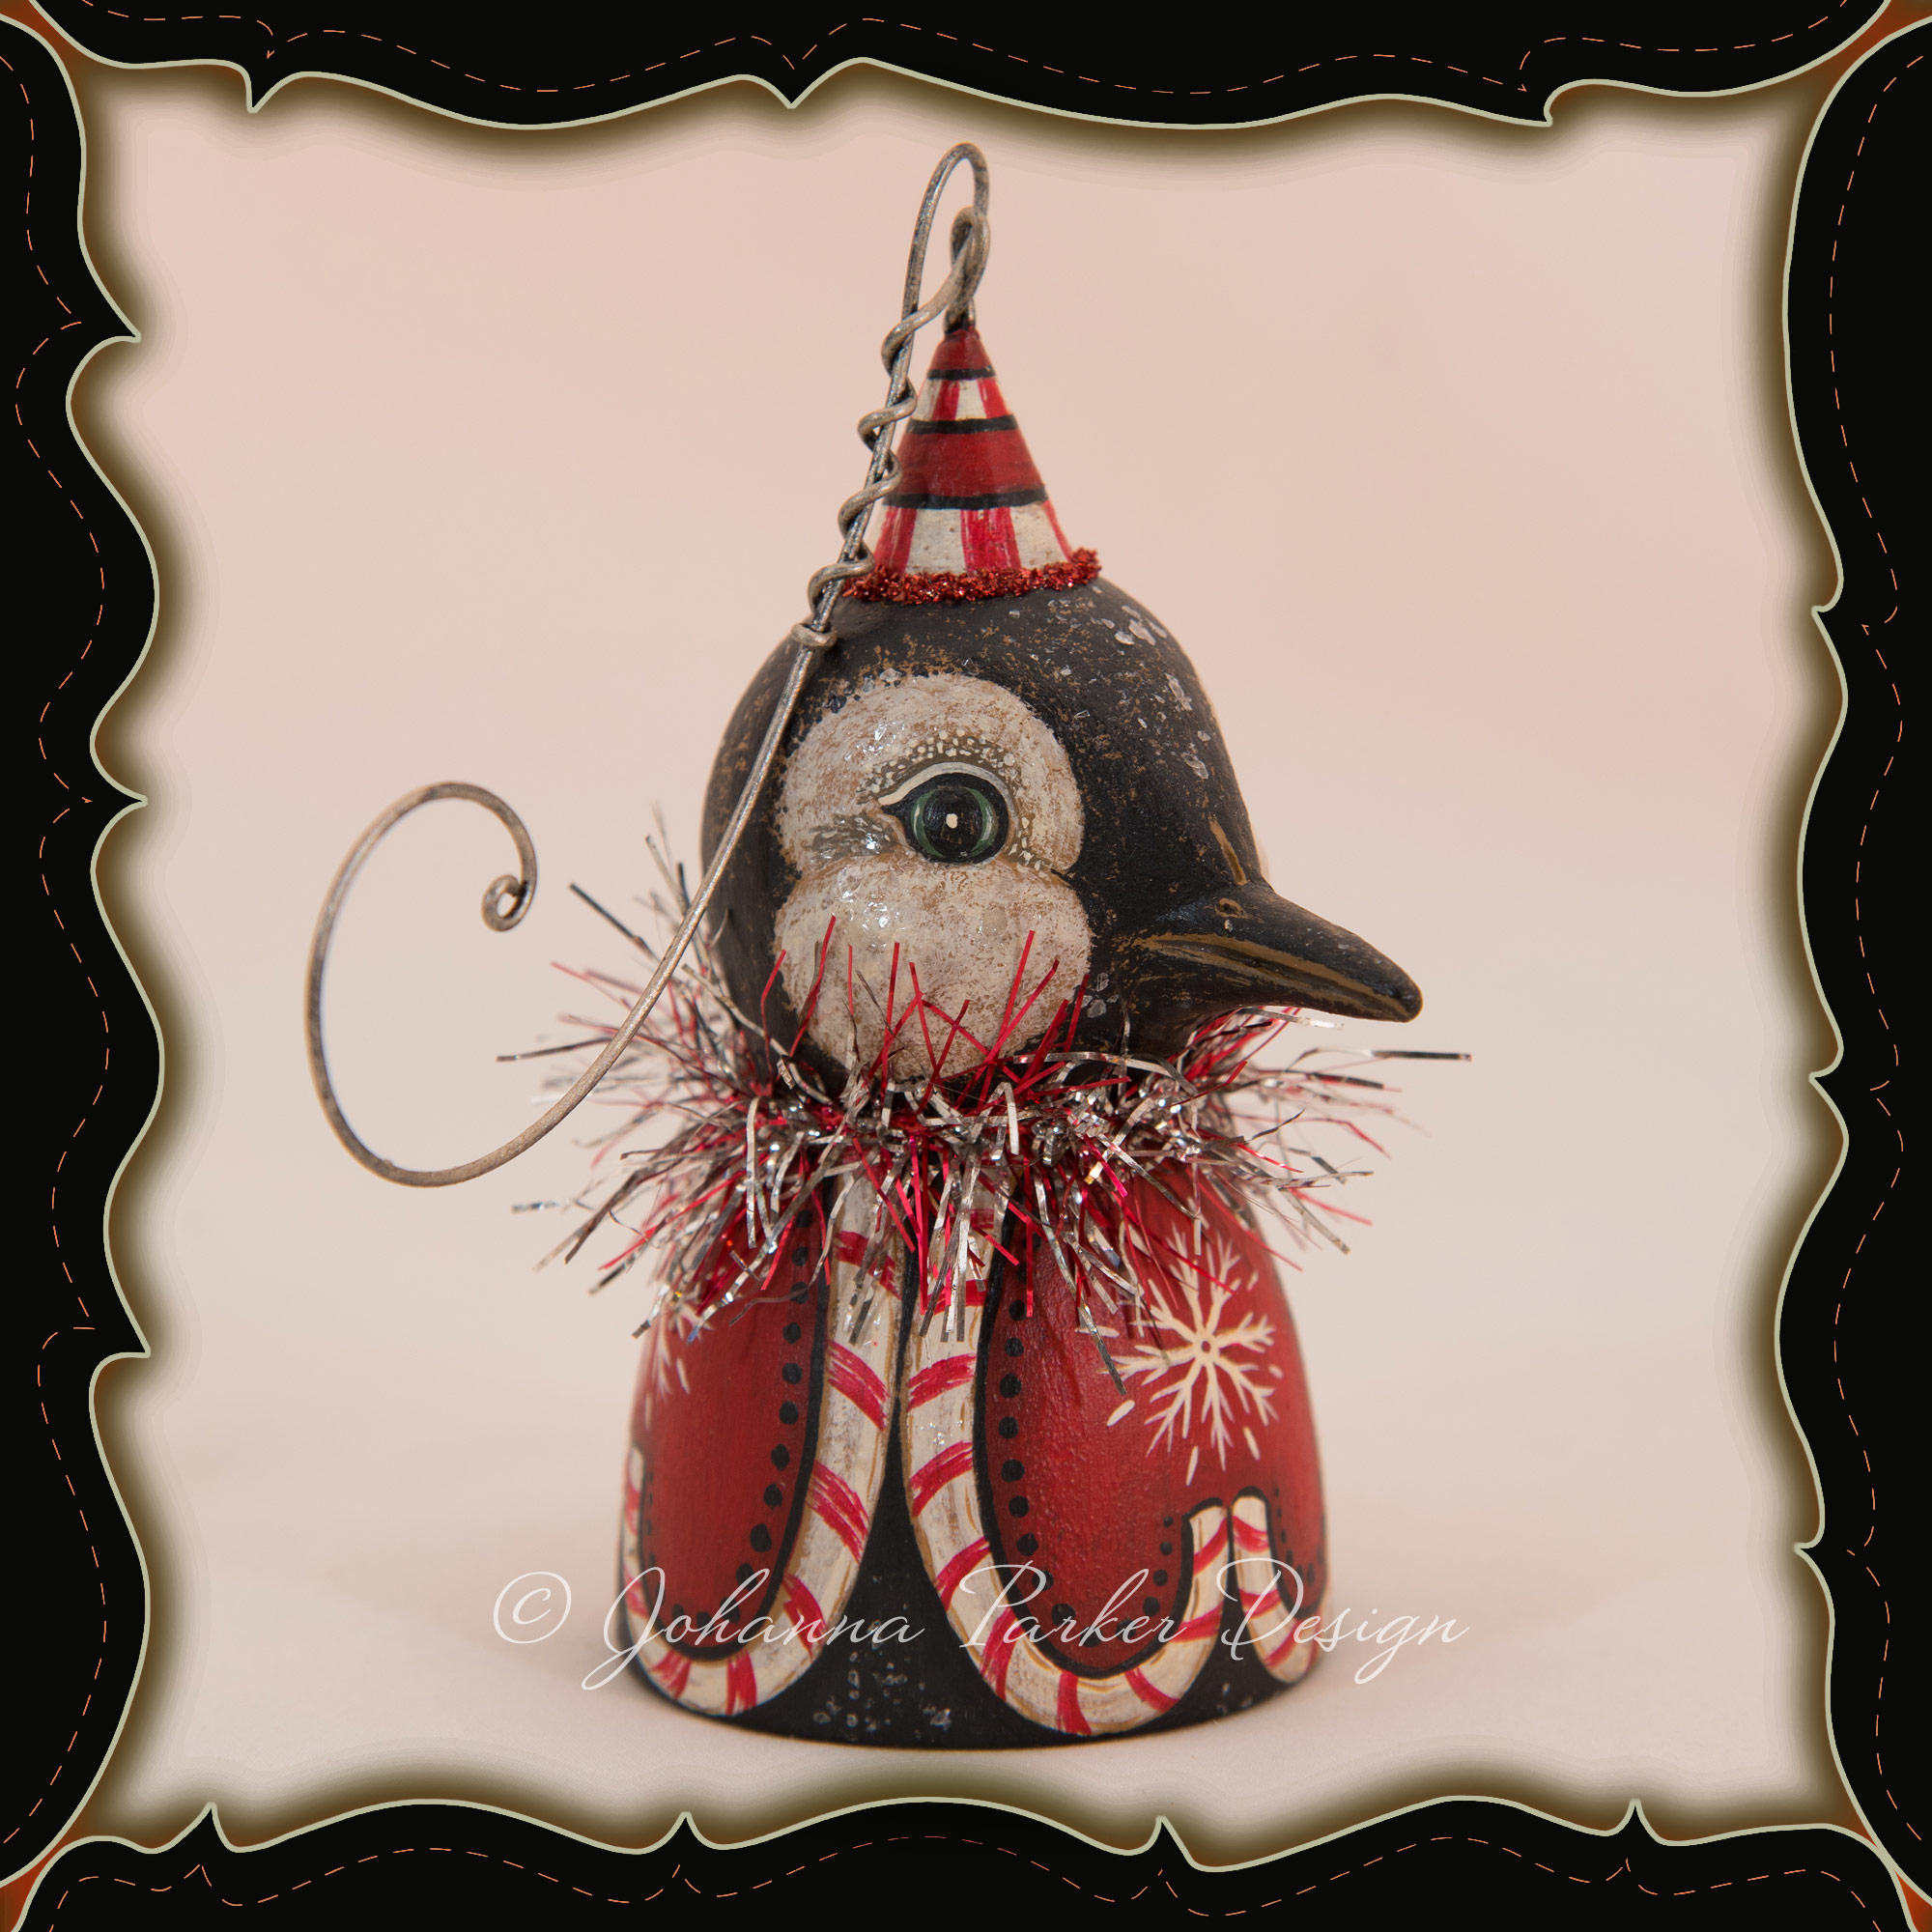 Johanna-Parker-Penguin-Ornament-Bell-framed.jpg